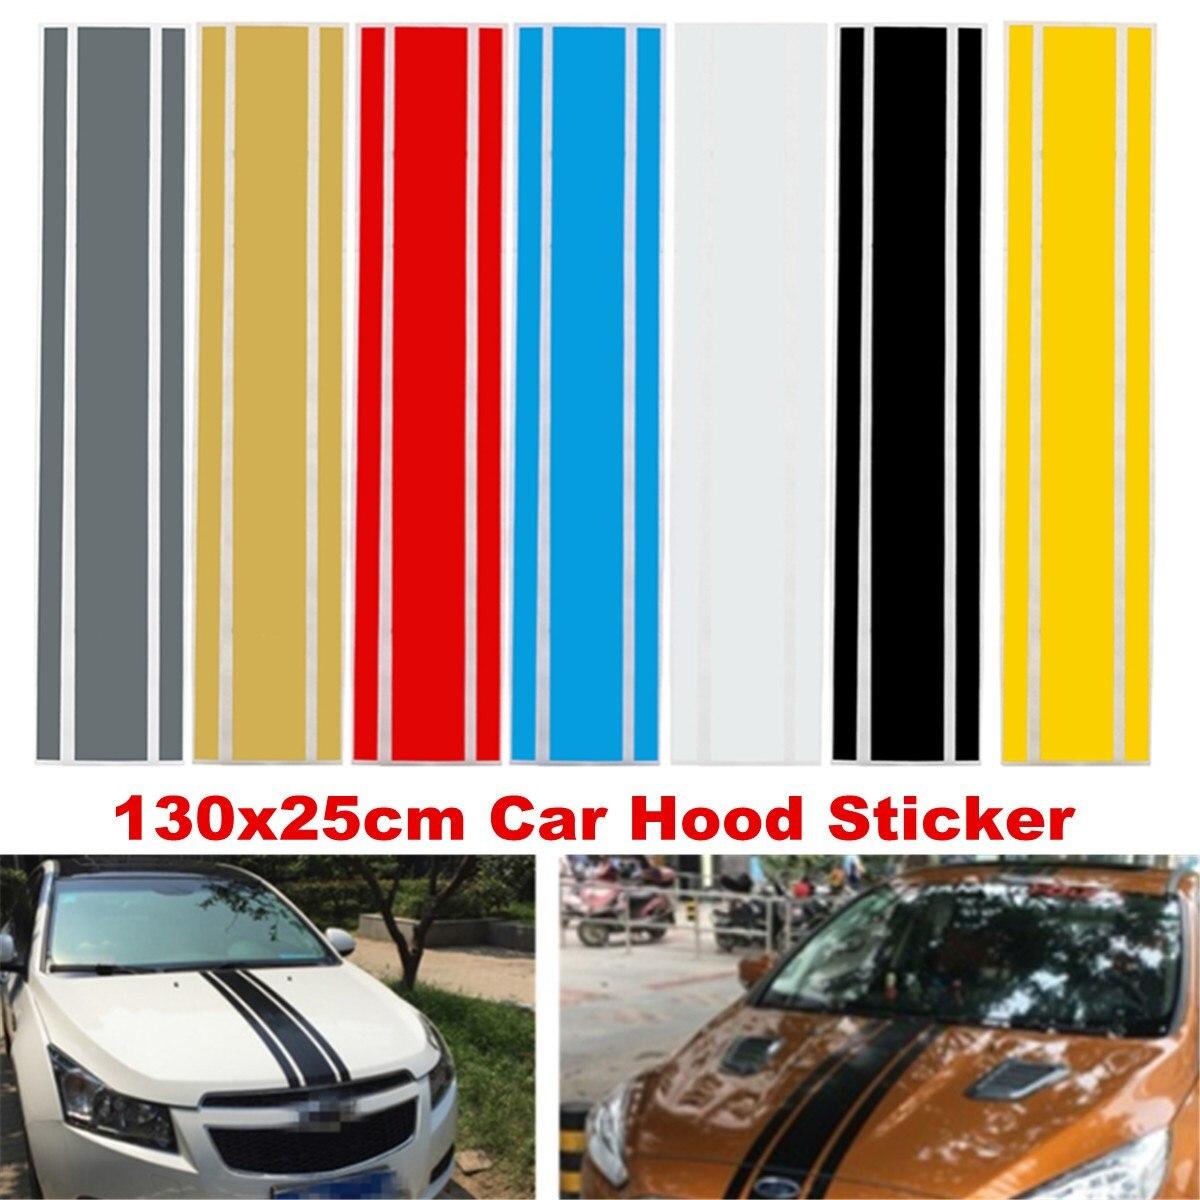 Car-Styling Decal Sticker Auto Motorcycle SUV Hood Engine Cover Vinyl DIY Decor Stripe Emblem Bandage Auto Accessories